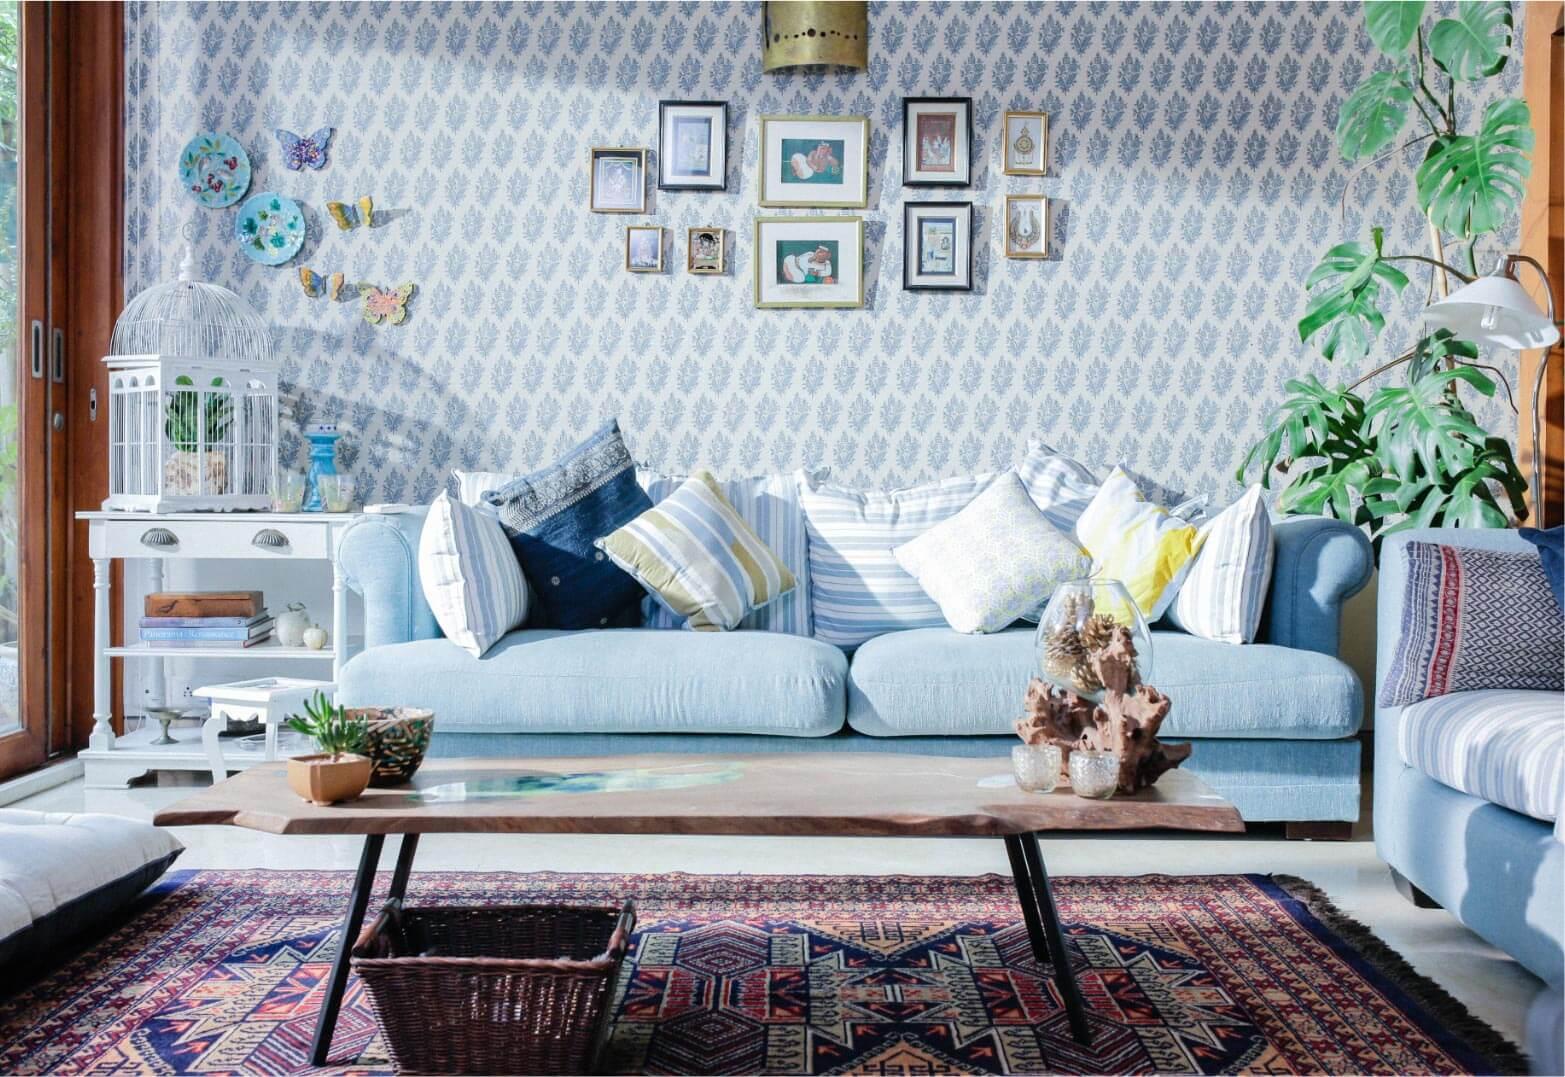 Miradorlife -Online Store for Custom and Designer Furniture, Home